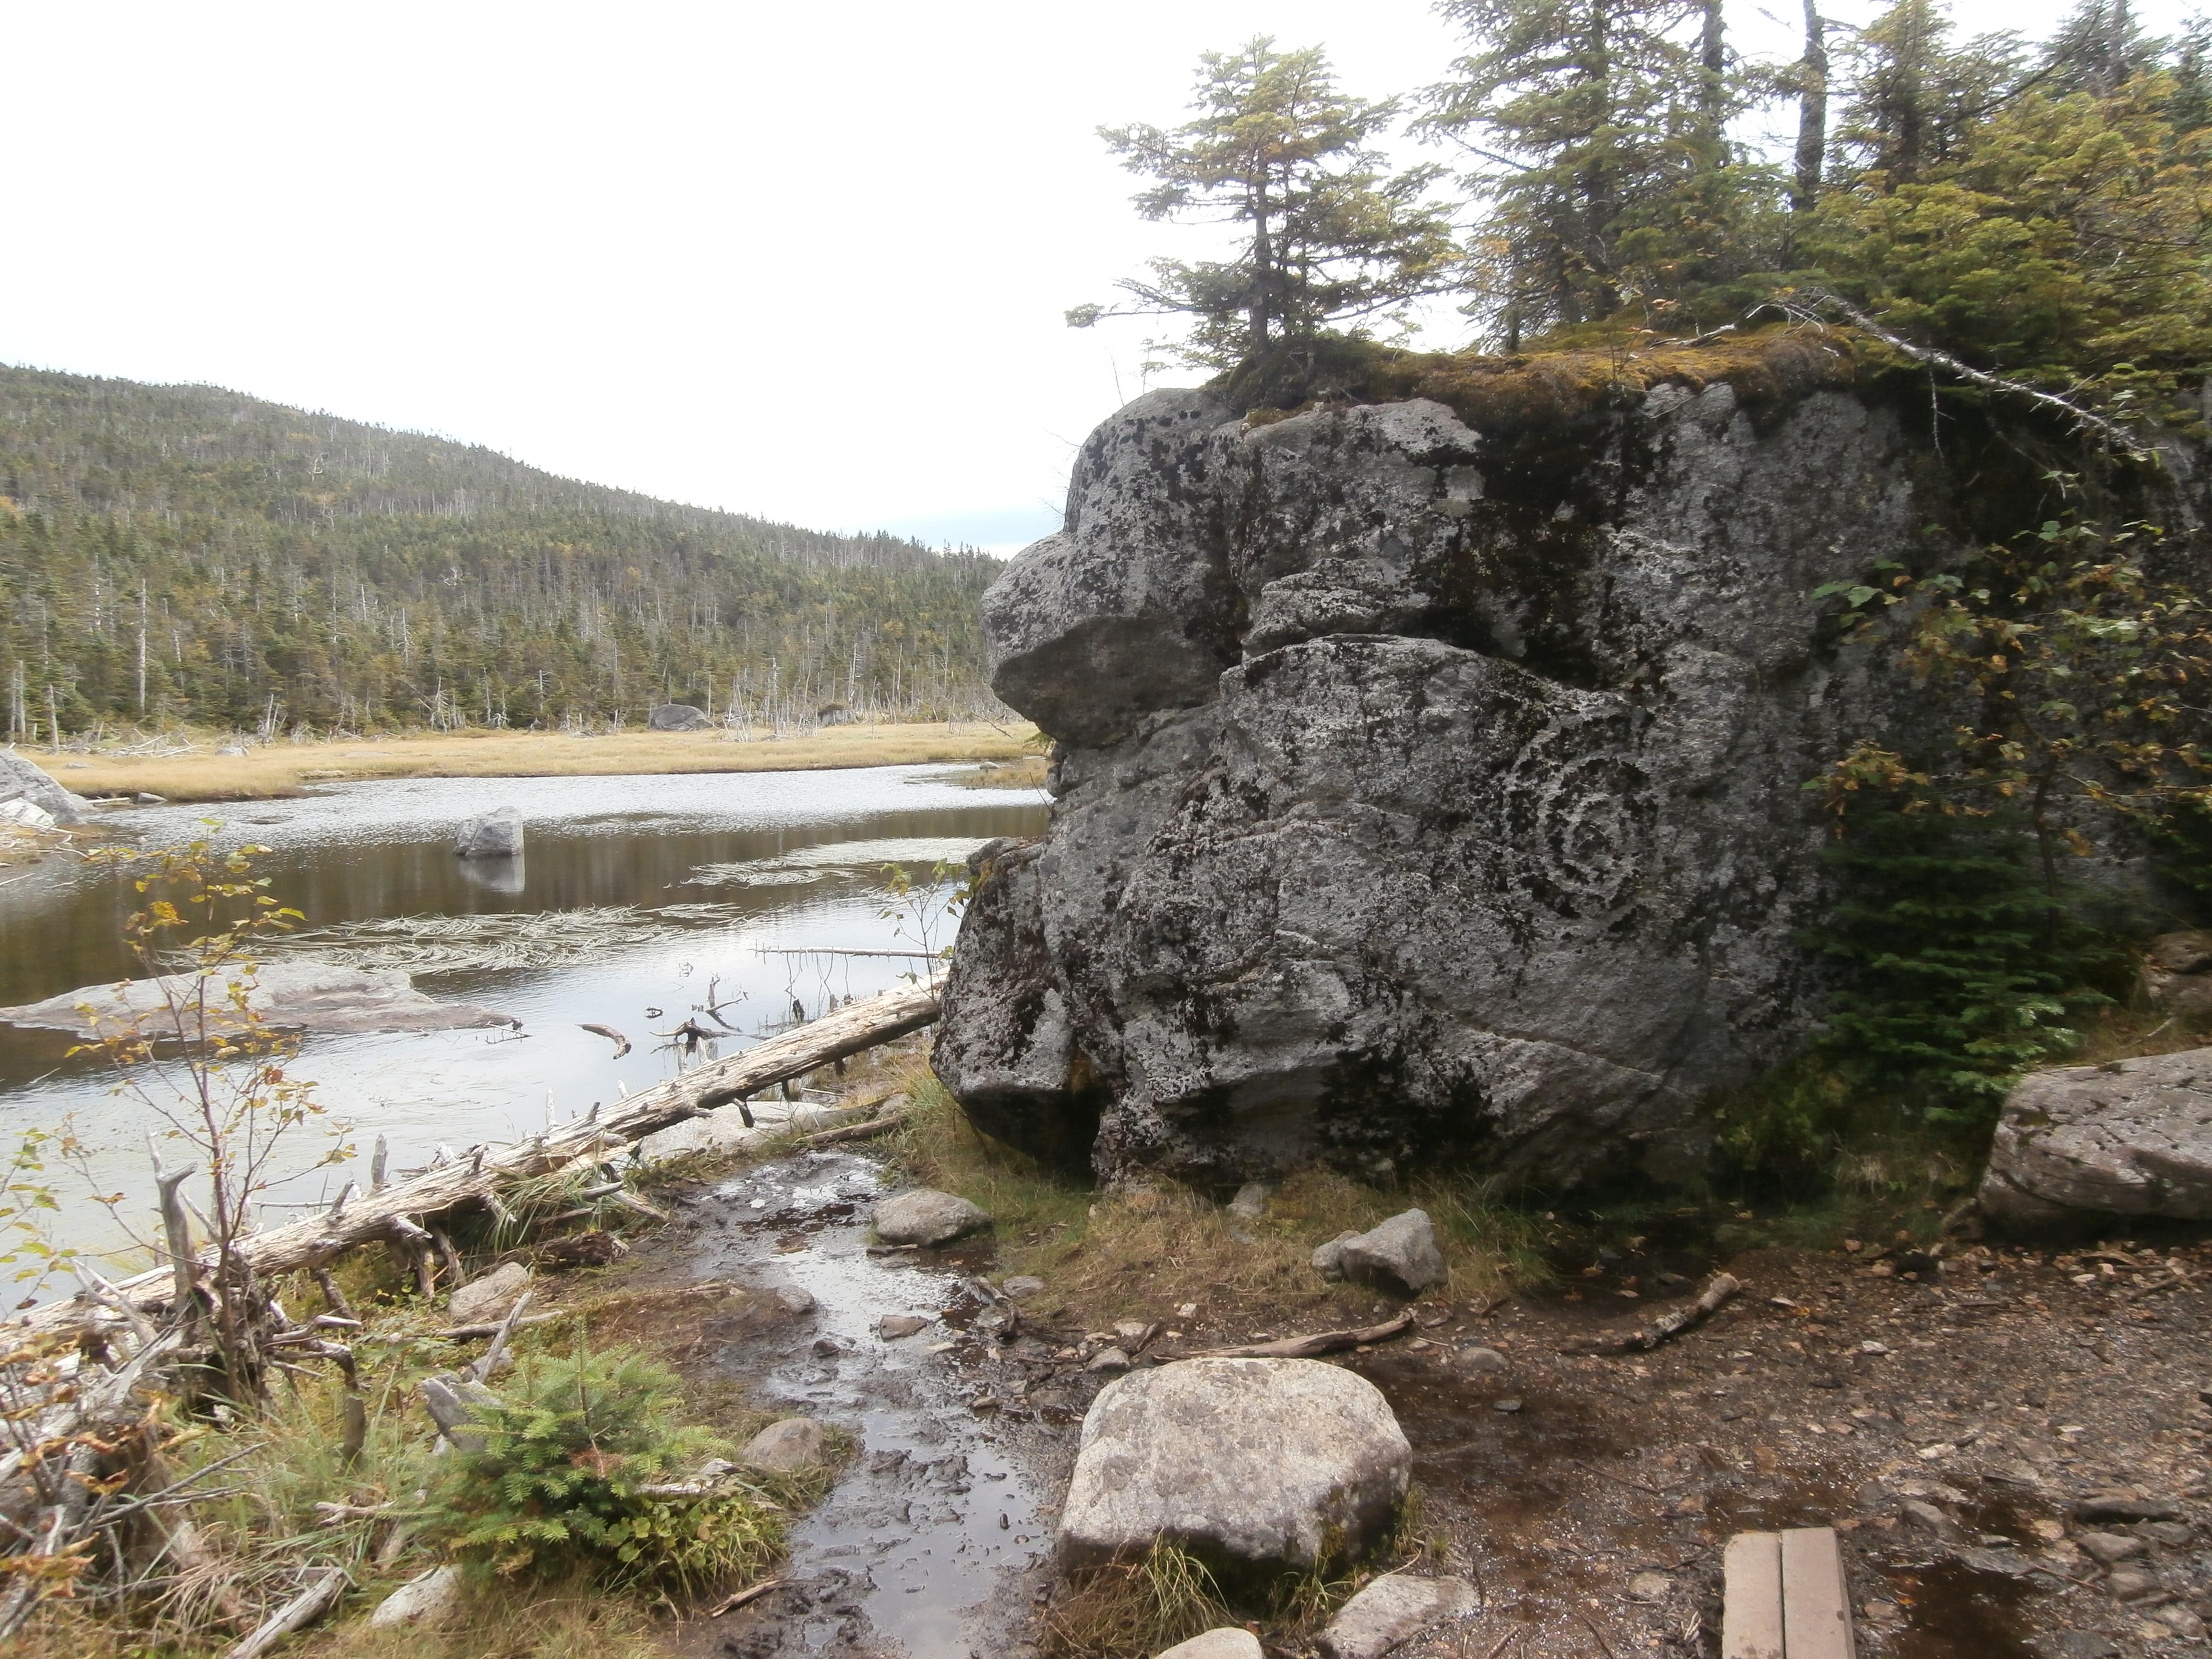 Unicornis Spiral Rock